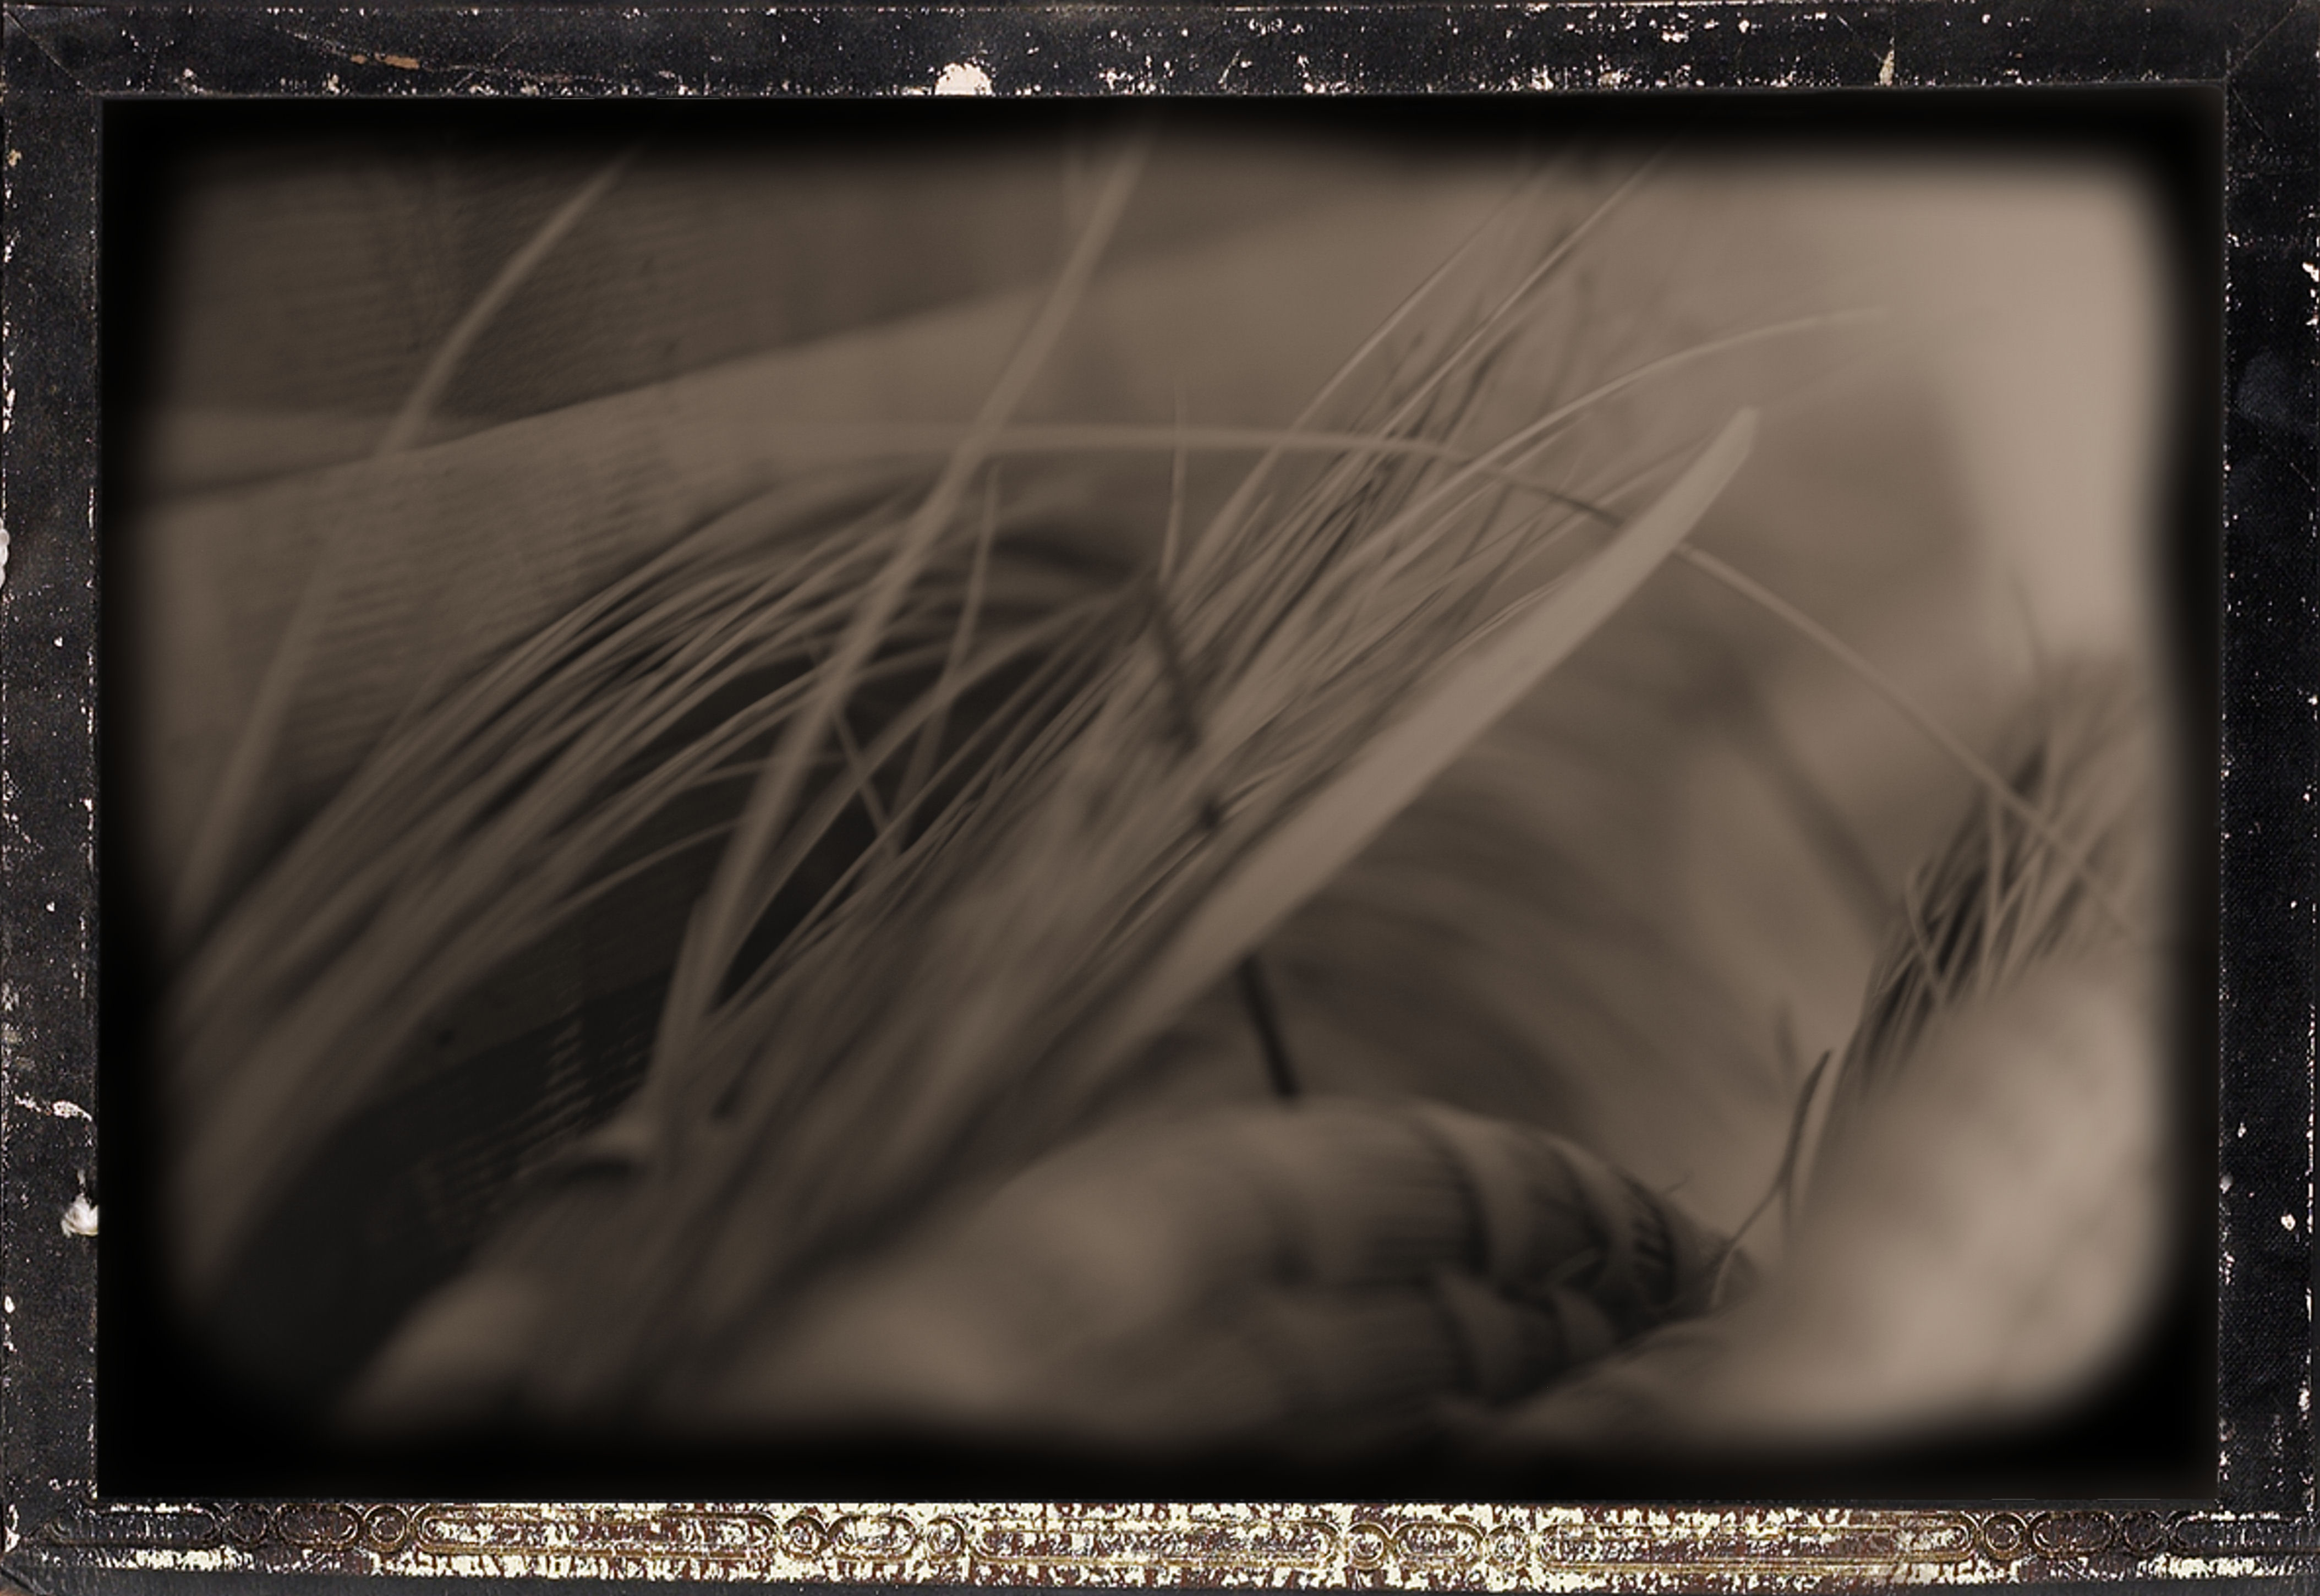 Sweetgrass 3